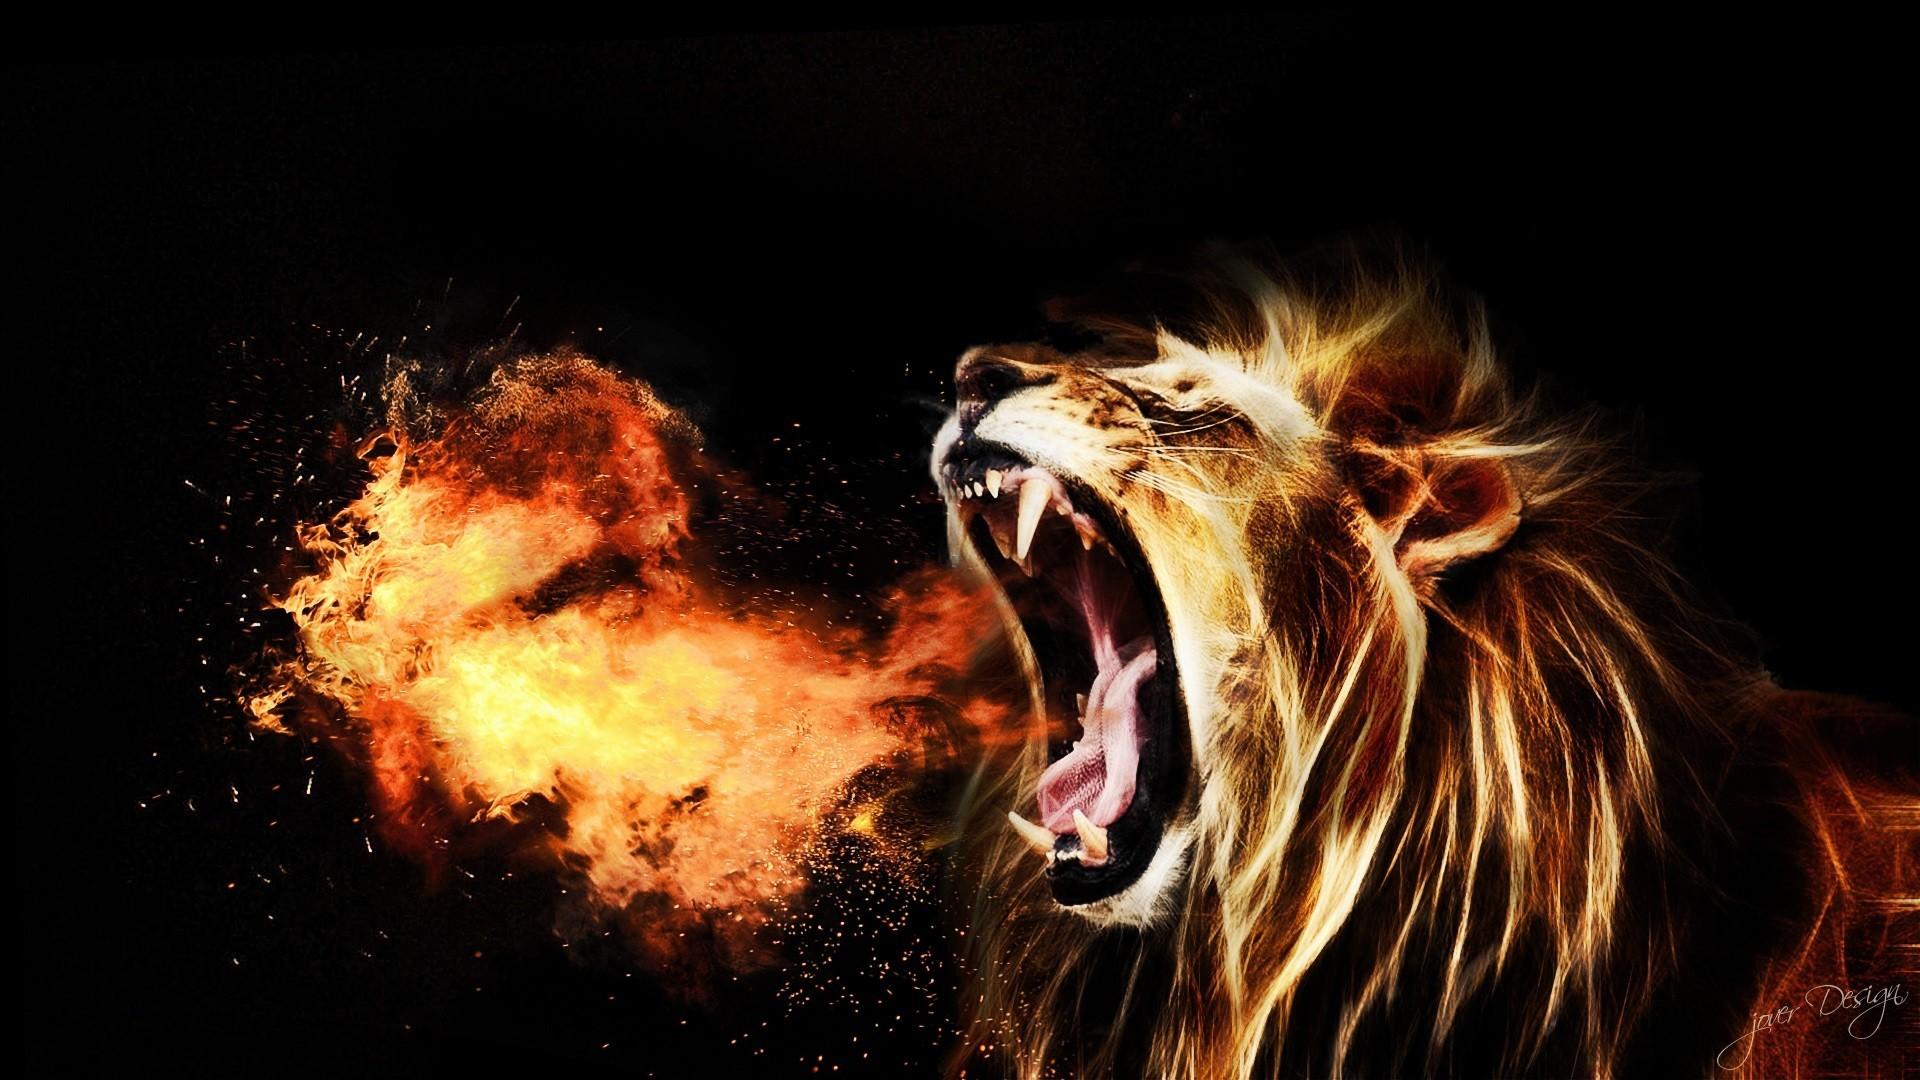 Wallpaper Lion Roar Hd Wallpaper: Lion Of Judah Wallpaper ·① WallpaperTag